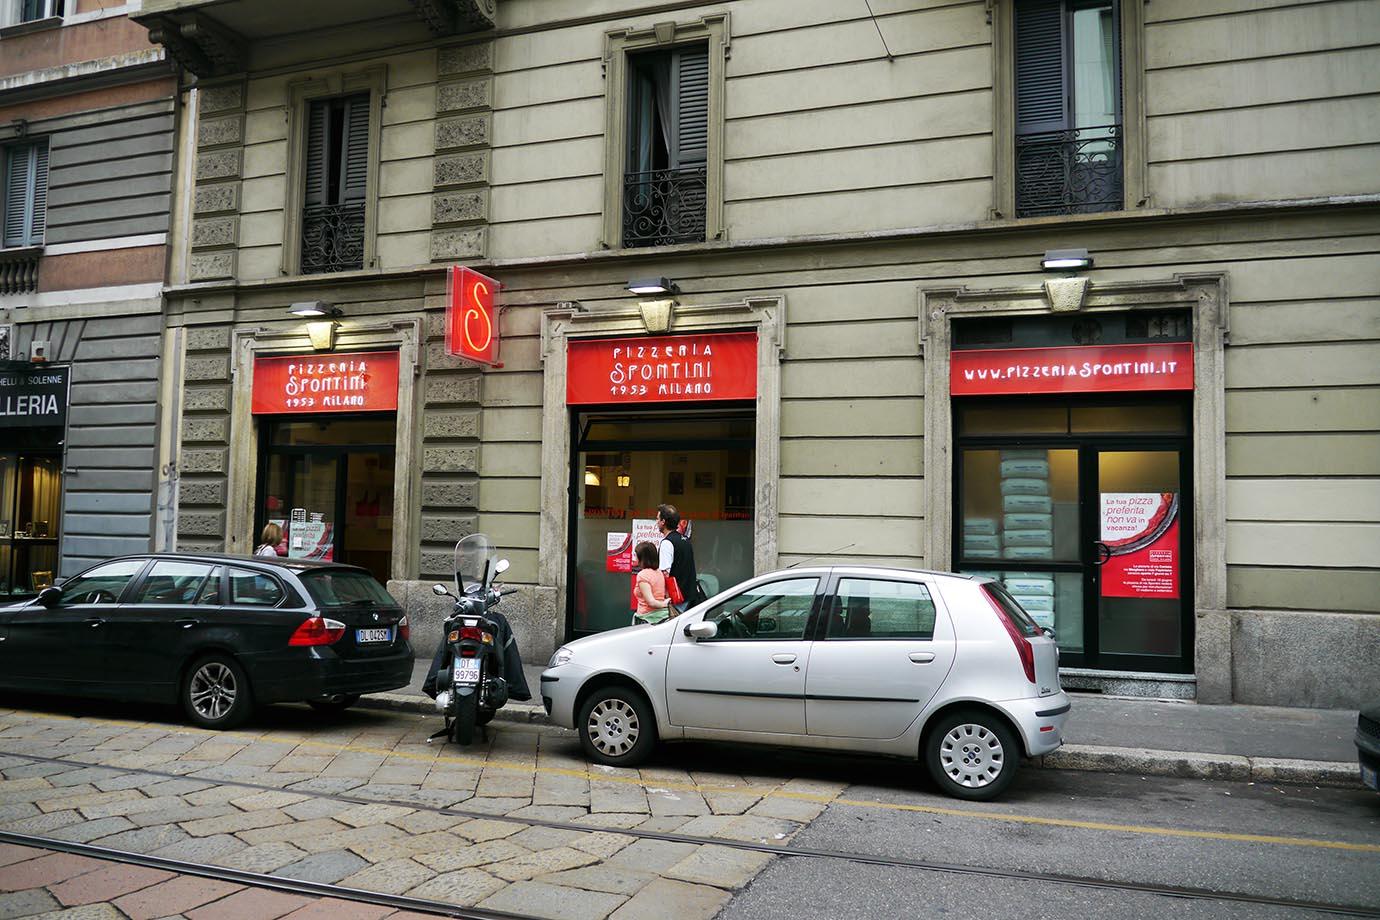 pizzeria-spontini4